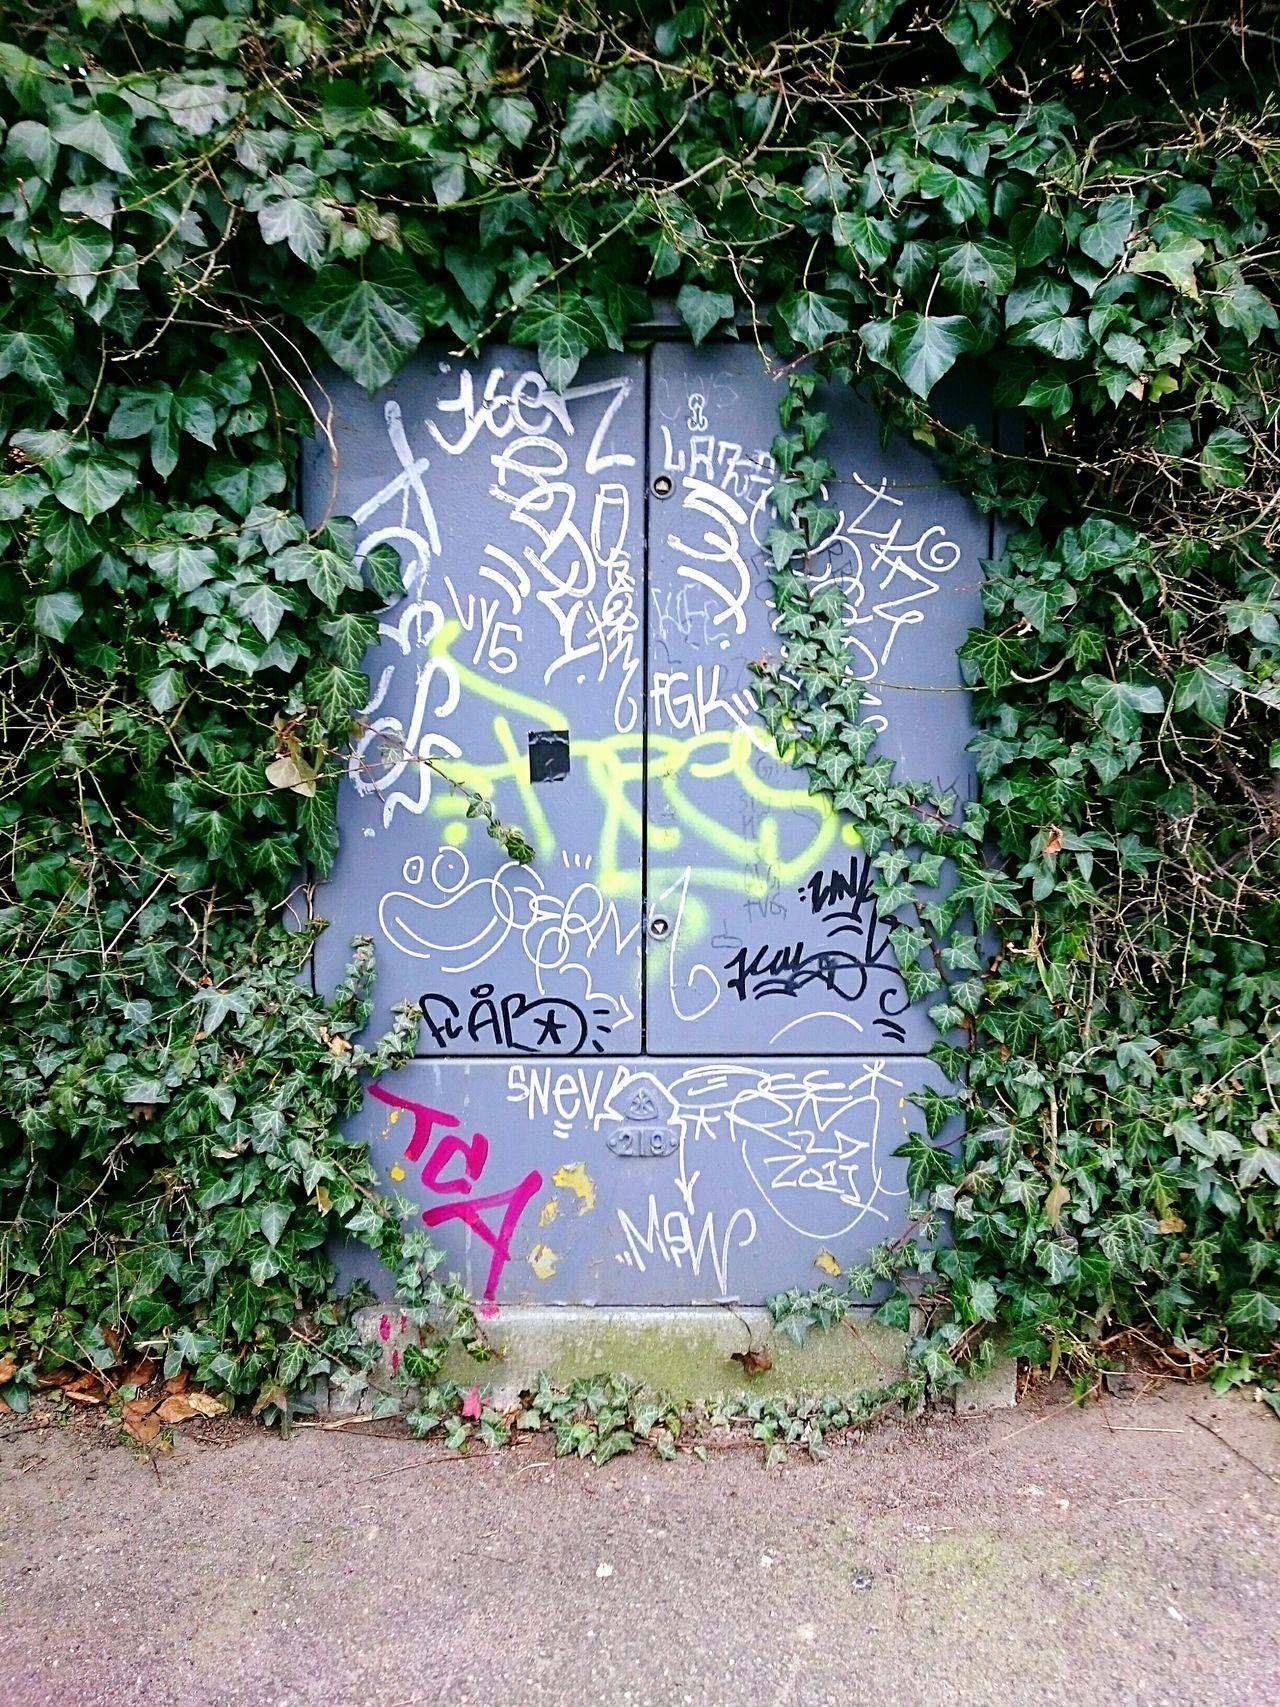 Graffiti Green Leaves Textures And Surfaces Takeover Naturevsmanmade Upclose Street Photography Manvsnature  Aerosol Spraypaint Urban Landscape The Street Photographer - 2016 EyeEm Awards